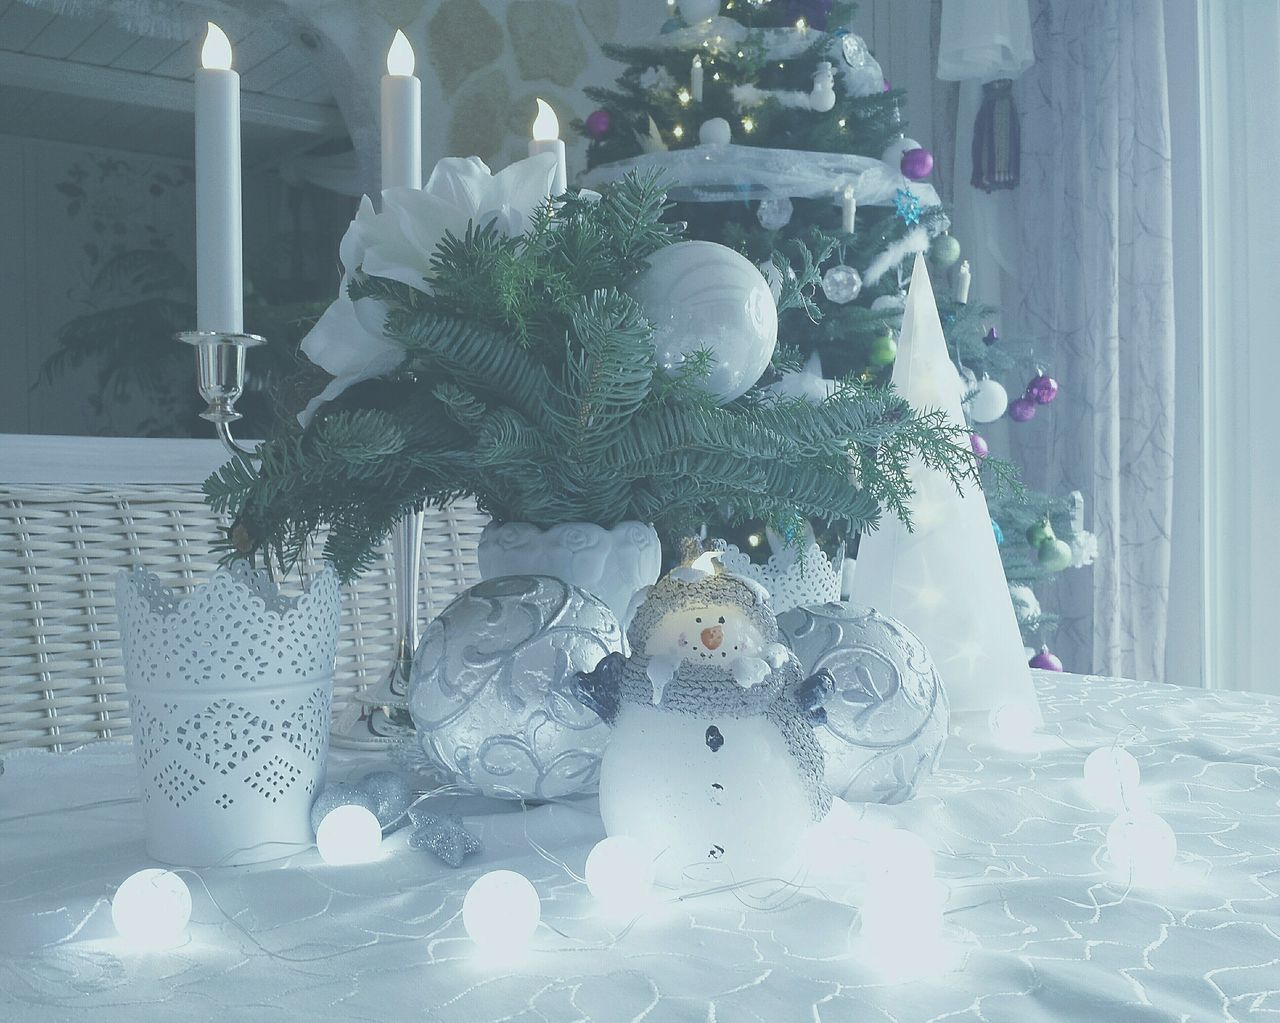 Tree No People Close-up Indoors  Ladyphotographerofthemonth Pastel Edit Snowman Still Life Stillleben Stillleben Mit Kerze Still Life With Candle Schneeman-kerze Snowman Candle